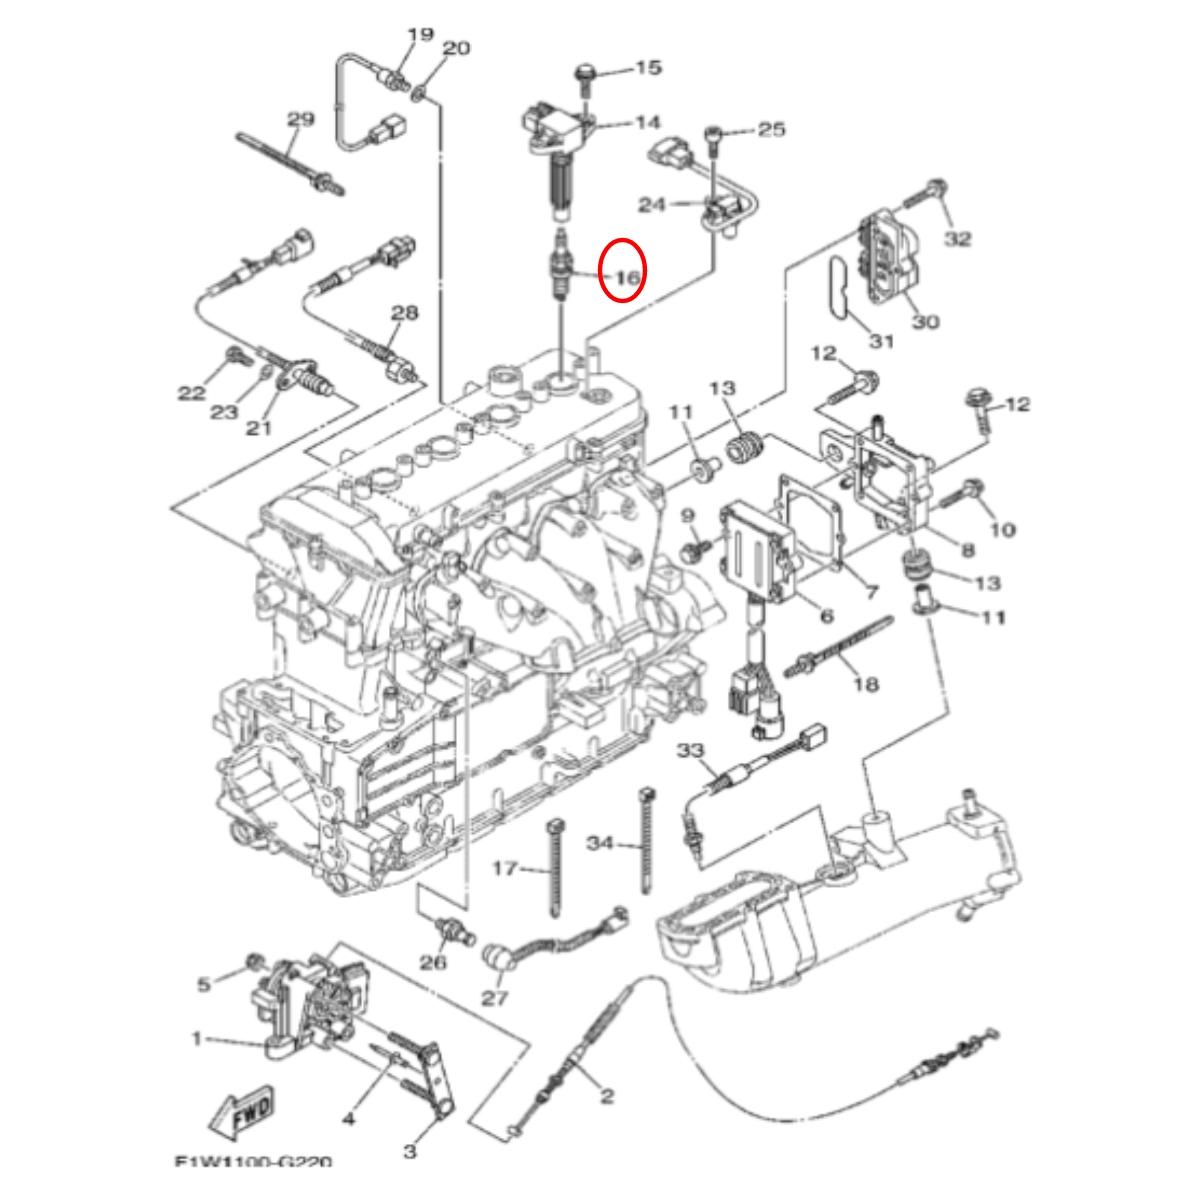 Vela LFR7AIX para Jet Ski Yamaha 1.8 SVHO de Iridium NGK (Unitária)  - Radical Peças - Peças para Jet Ski